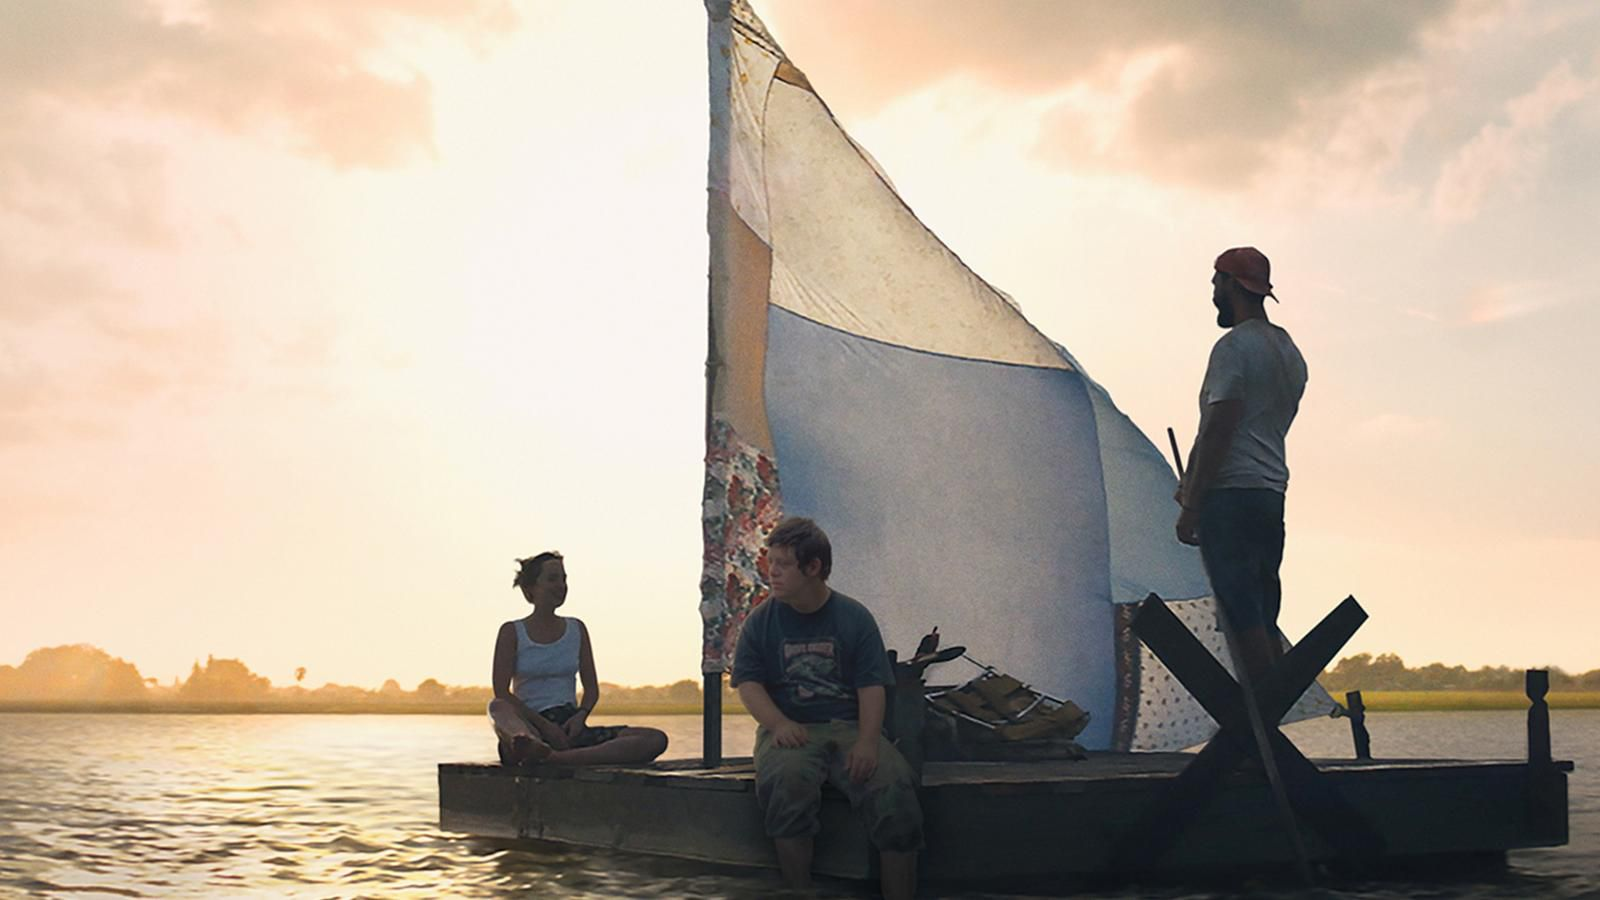 Raft scene from The Peanut Butter Falcon